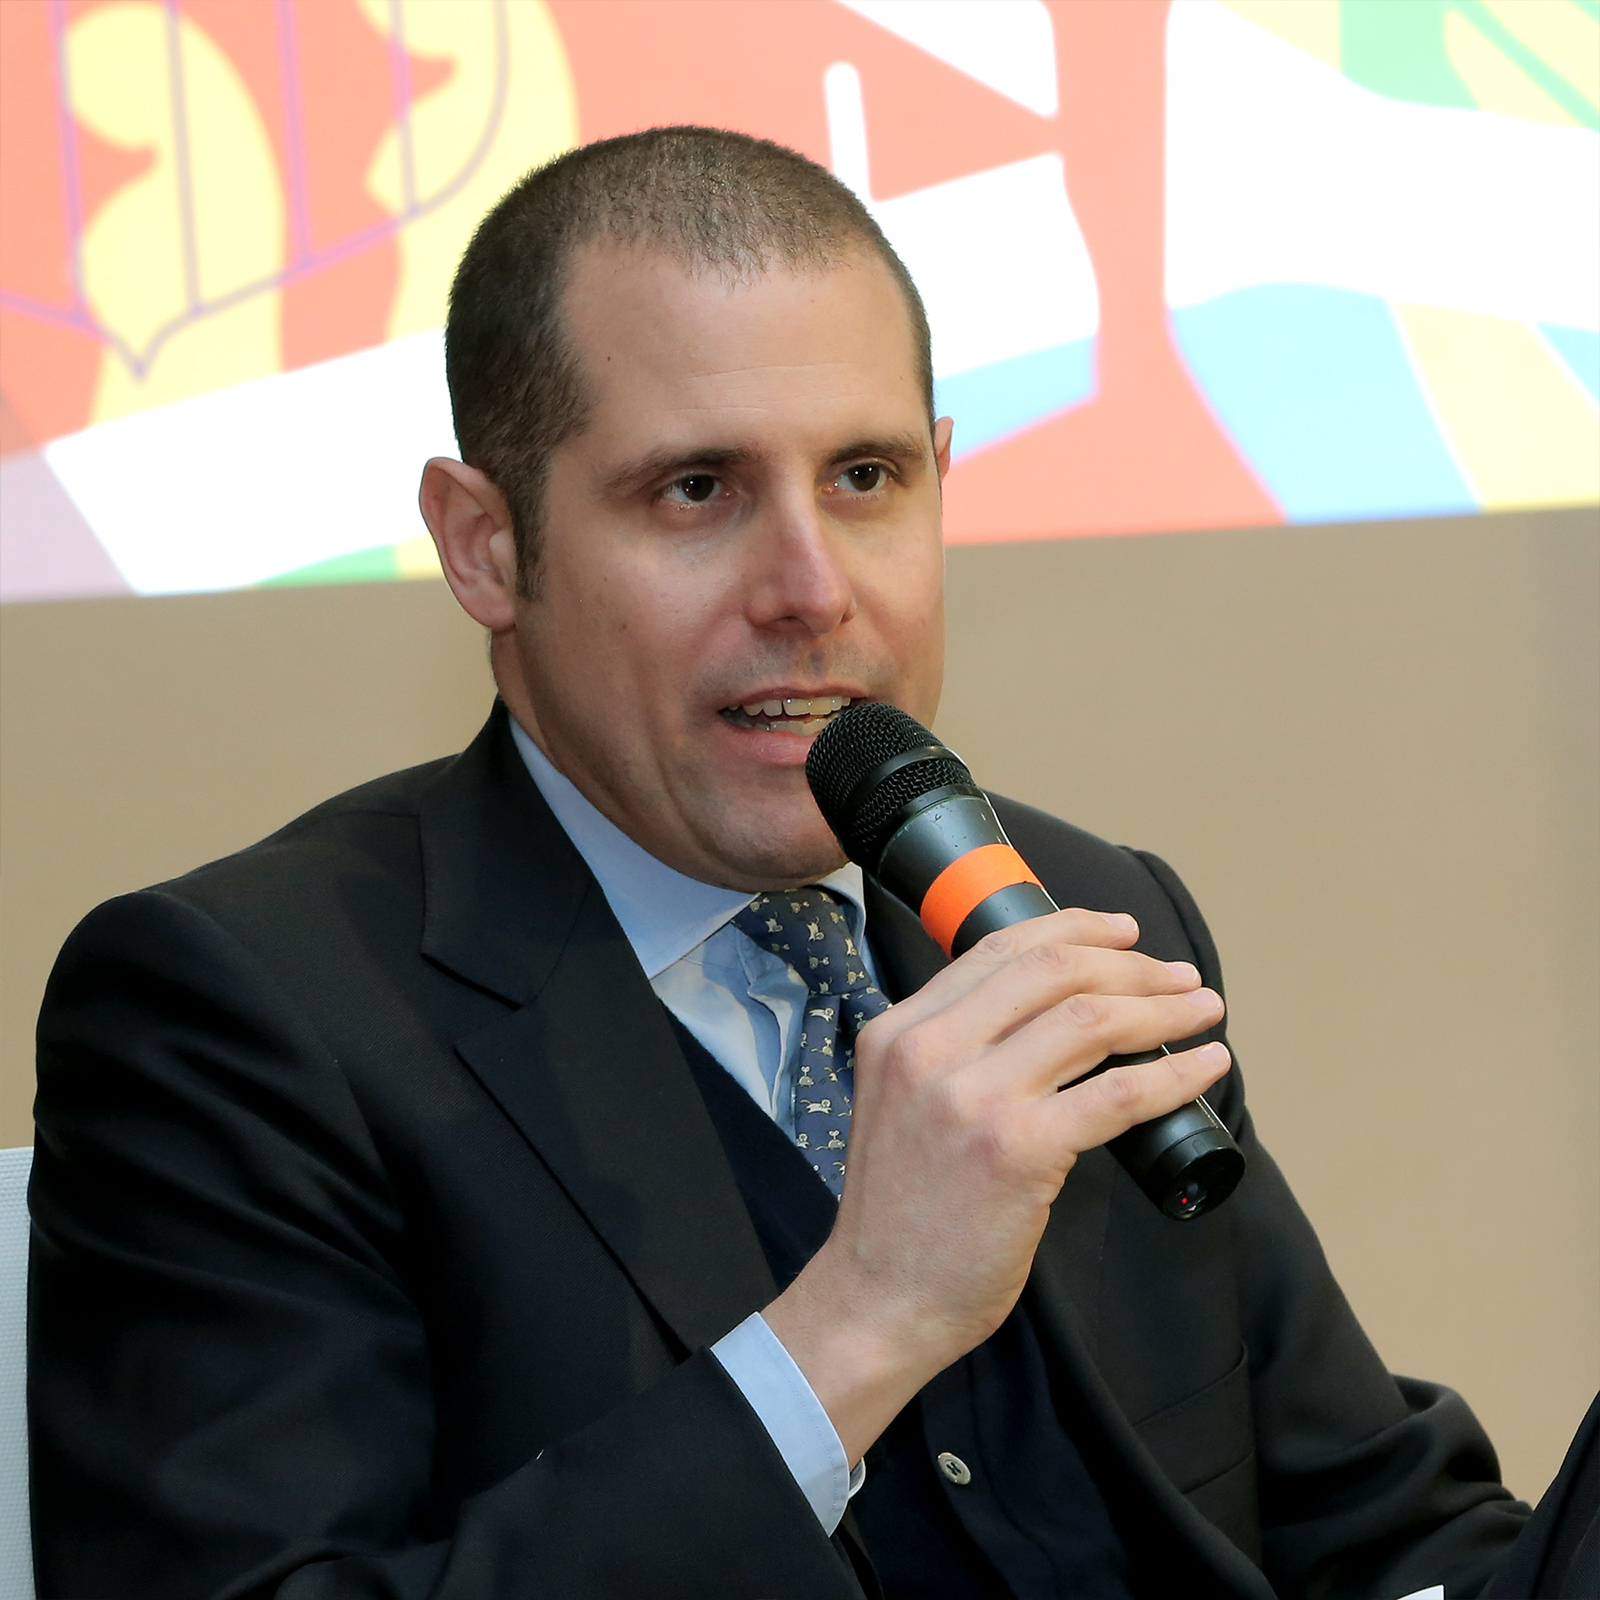 Paolo Posteraro